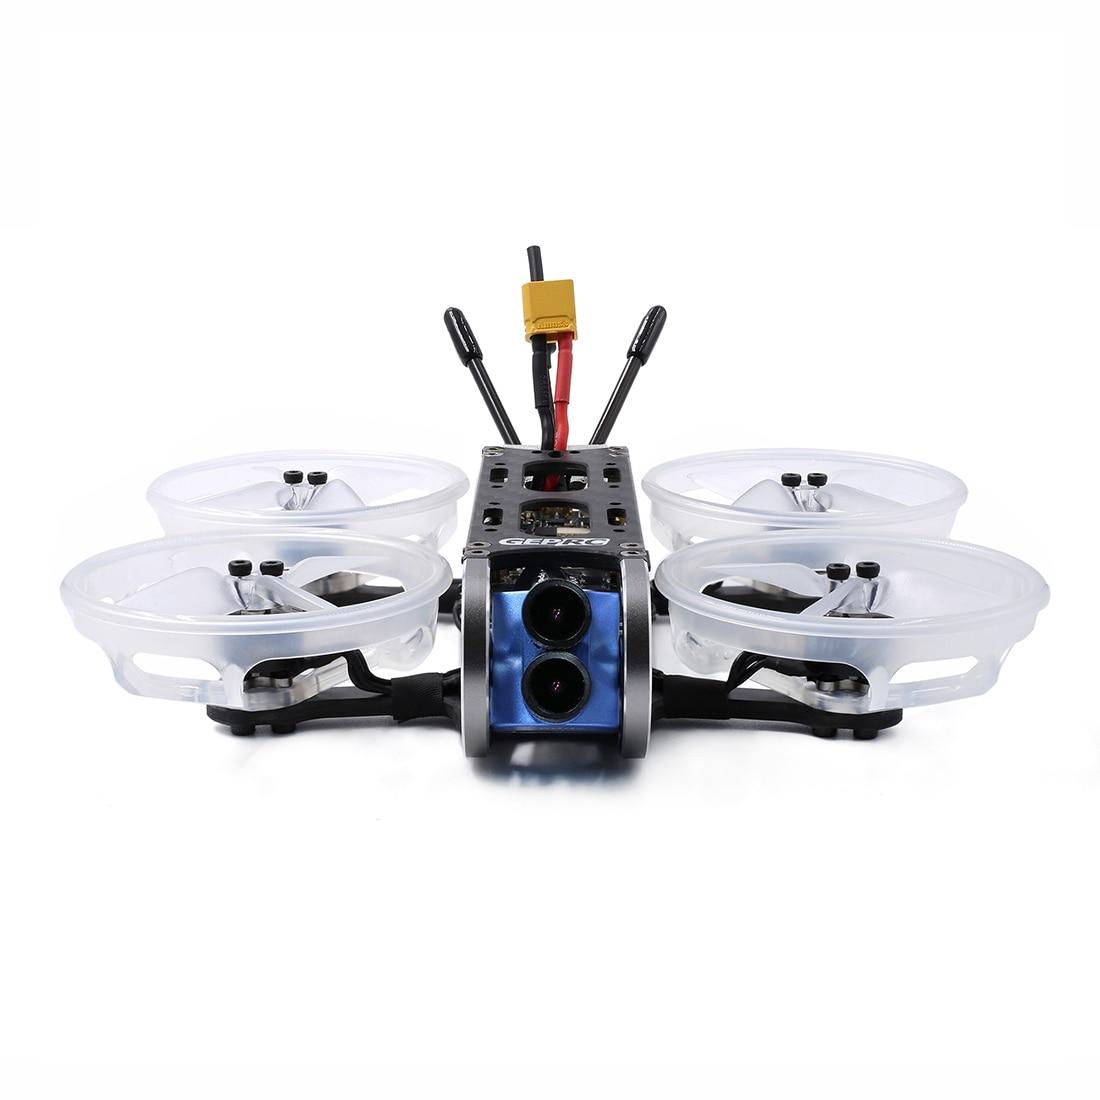 GEPRC CinePro 4K HD 3-4S FPV Racing Drone Advanced Version FRSKY BNF F722 FC Caddx Tarsier 4K 35A ESC 5.8G 48CH 0~500mW VTX